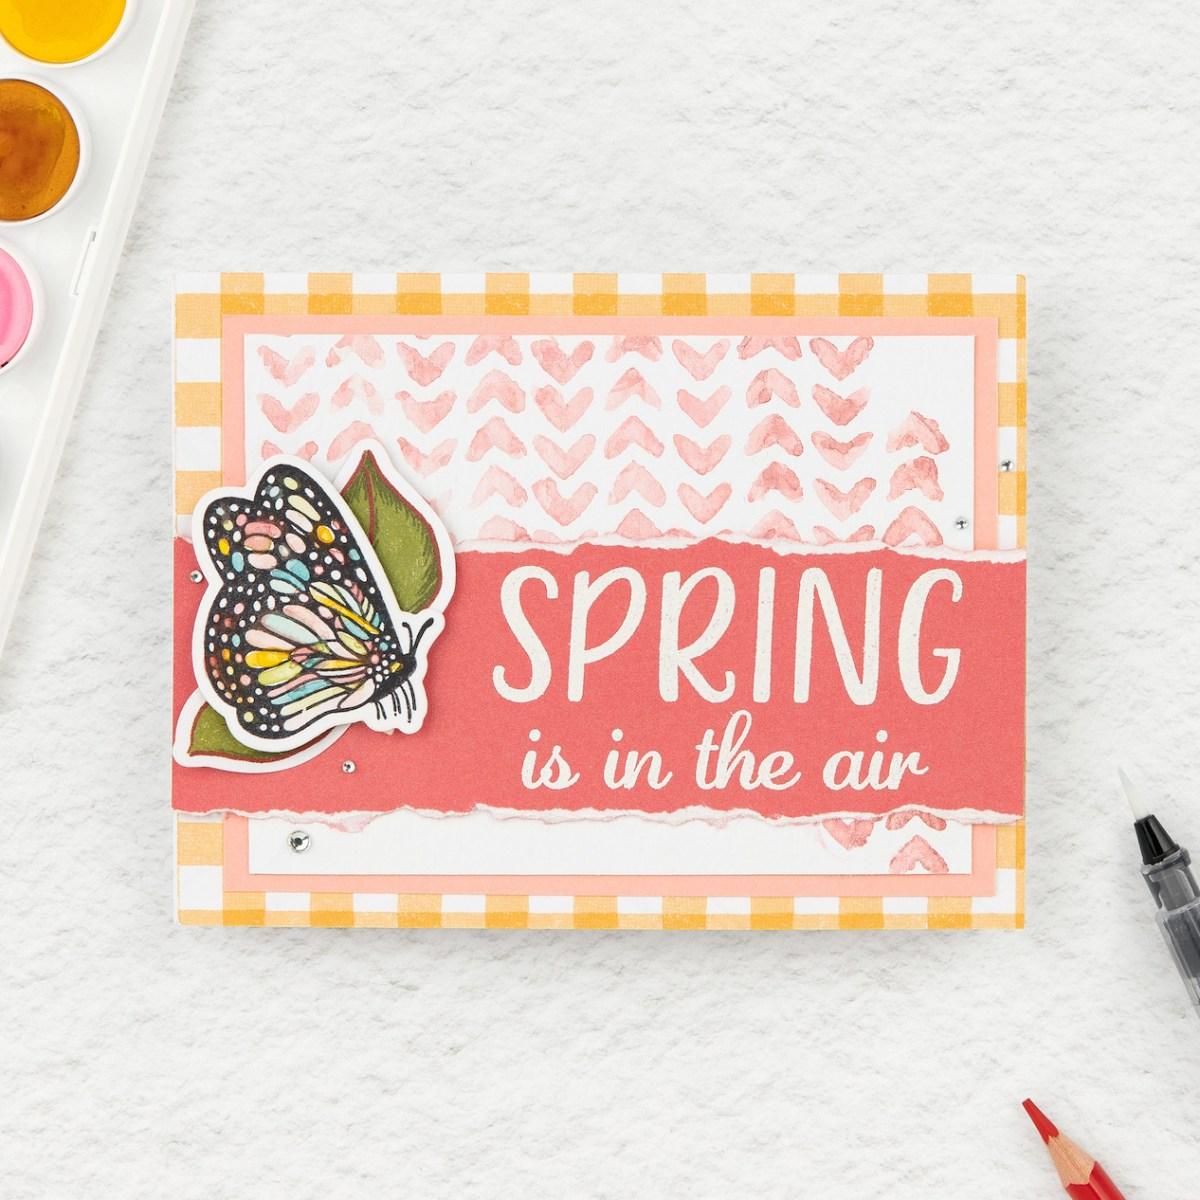 Watercolor Techniques #closetomyheart #ctmh #ctmhdaisymeadows #watercolor #watercolour #waterbrush #watercolorpencils #watercolourpencils #watercolortechniques #watercolourtechniques #scrapbooking #cardmaking #springisintheair